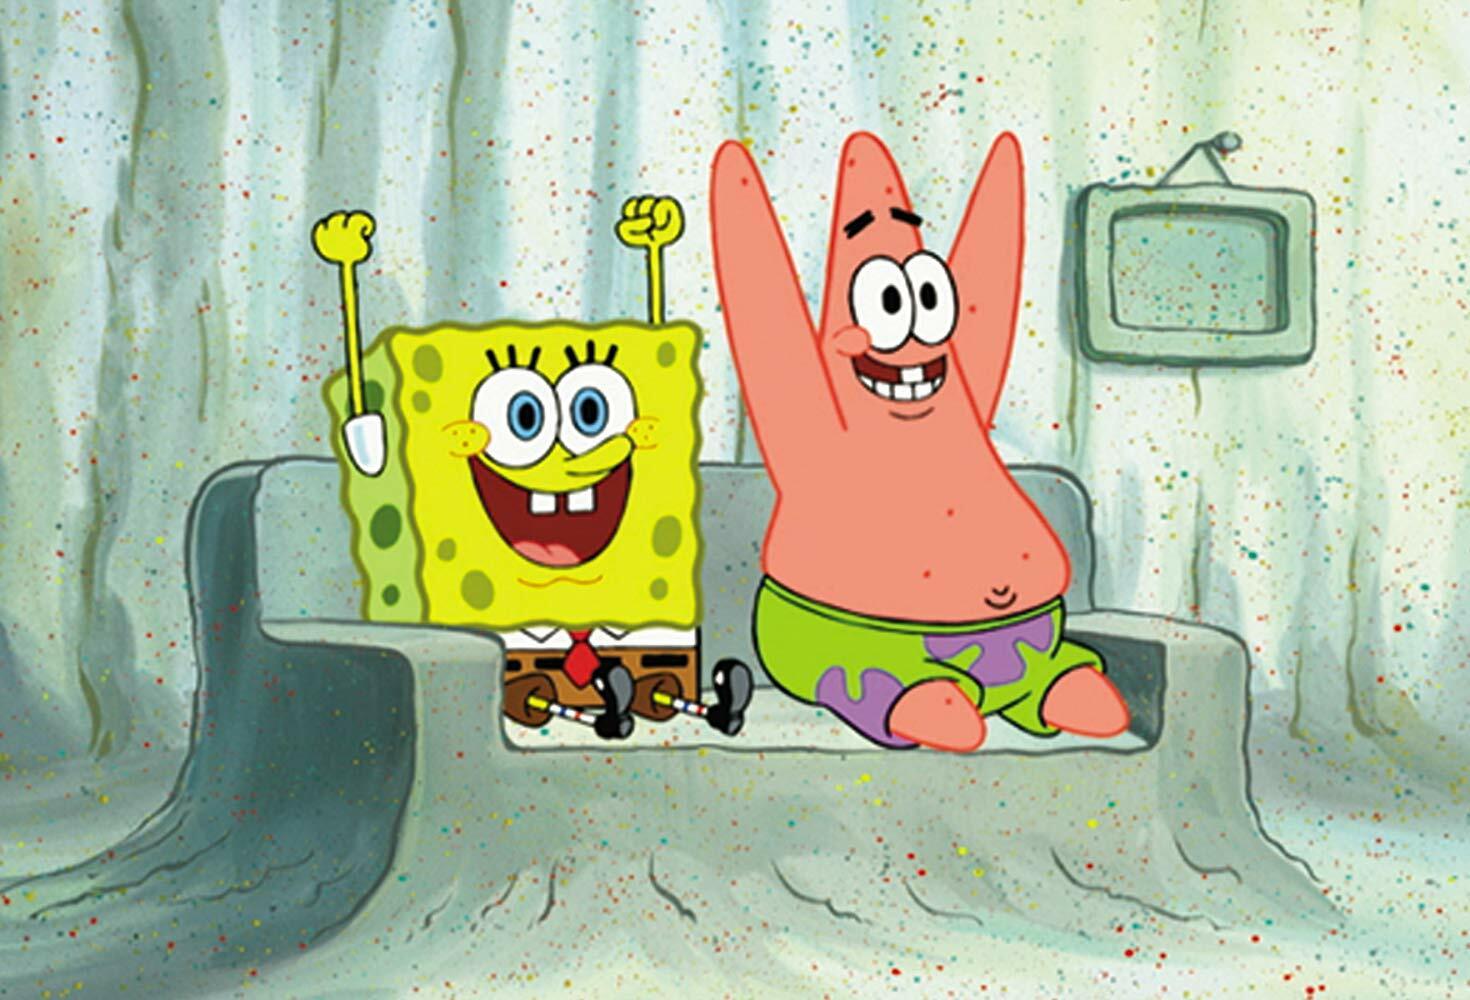 Celebrate with Nickelodeon: Spongebob PartyPants